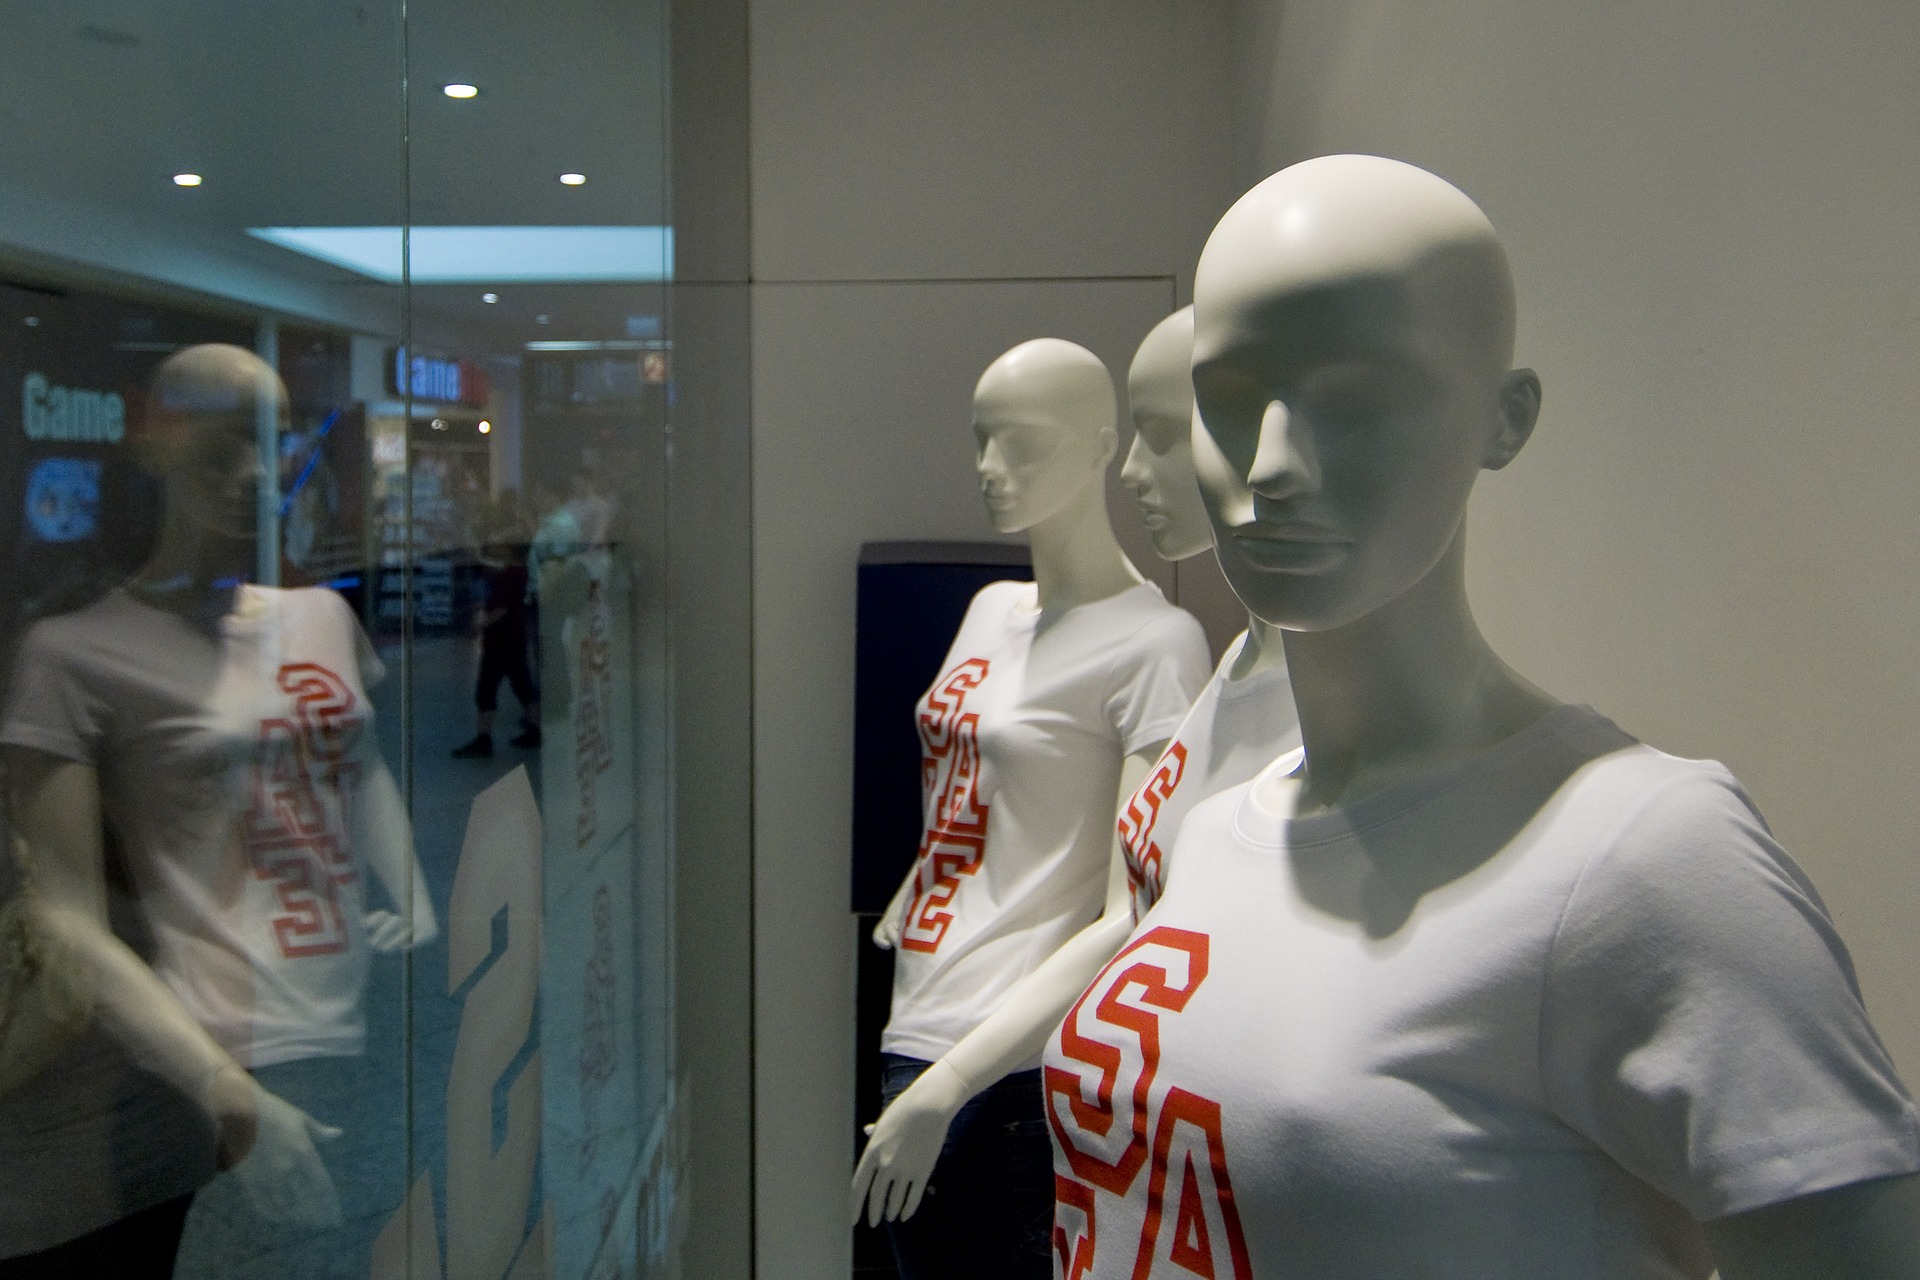 mannequins-2619624_1920